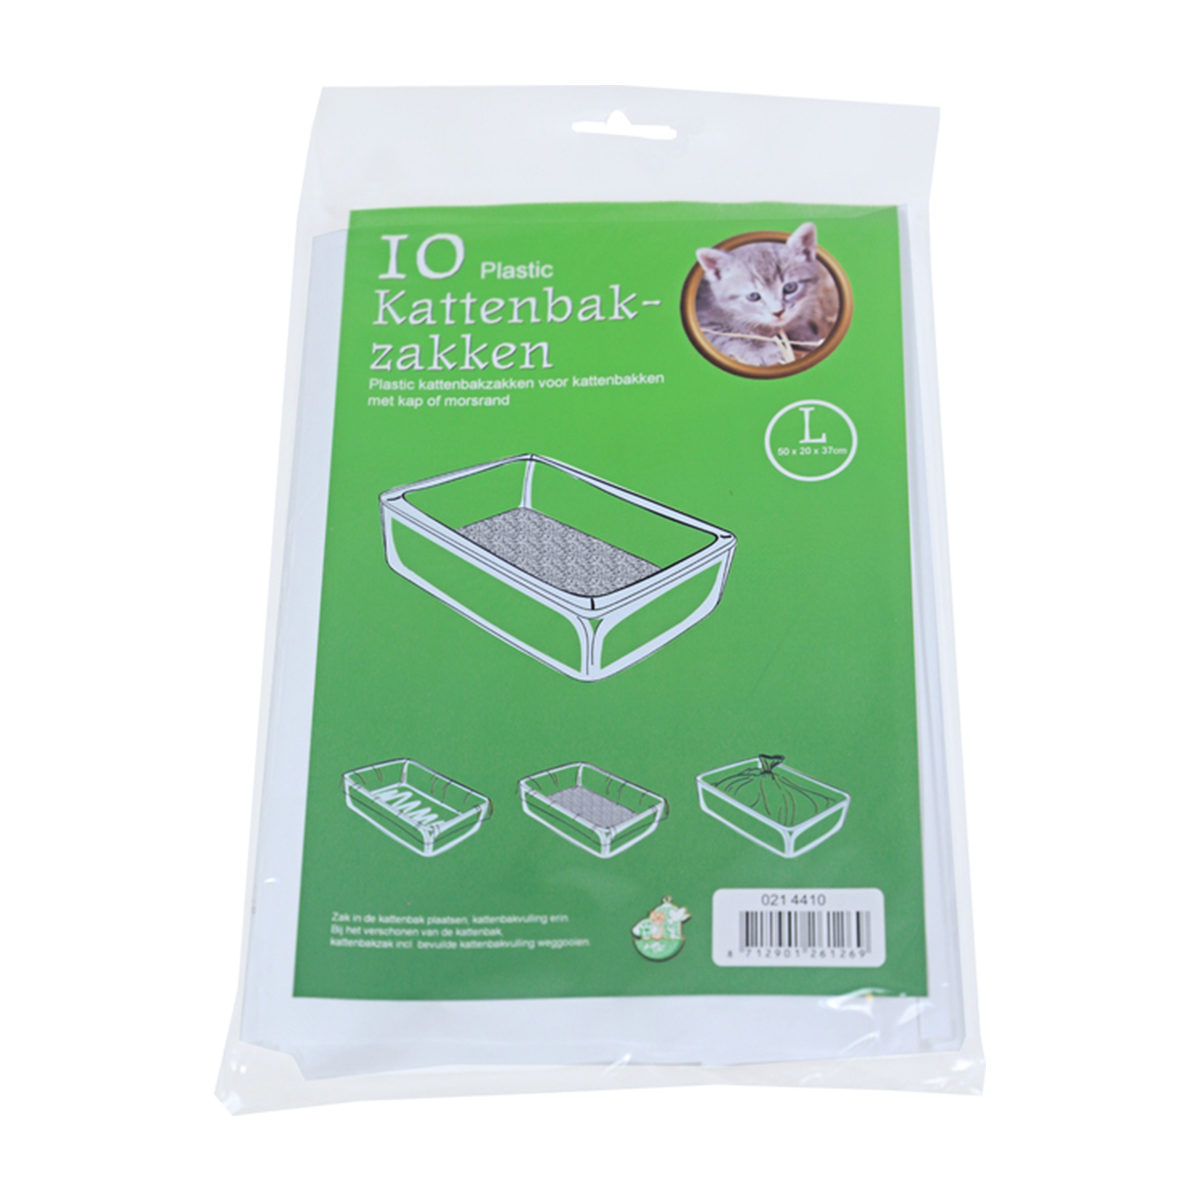 Kattenbakzakken 1 Pak Groot - in Kattenbakken & kattenbakaccessoires